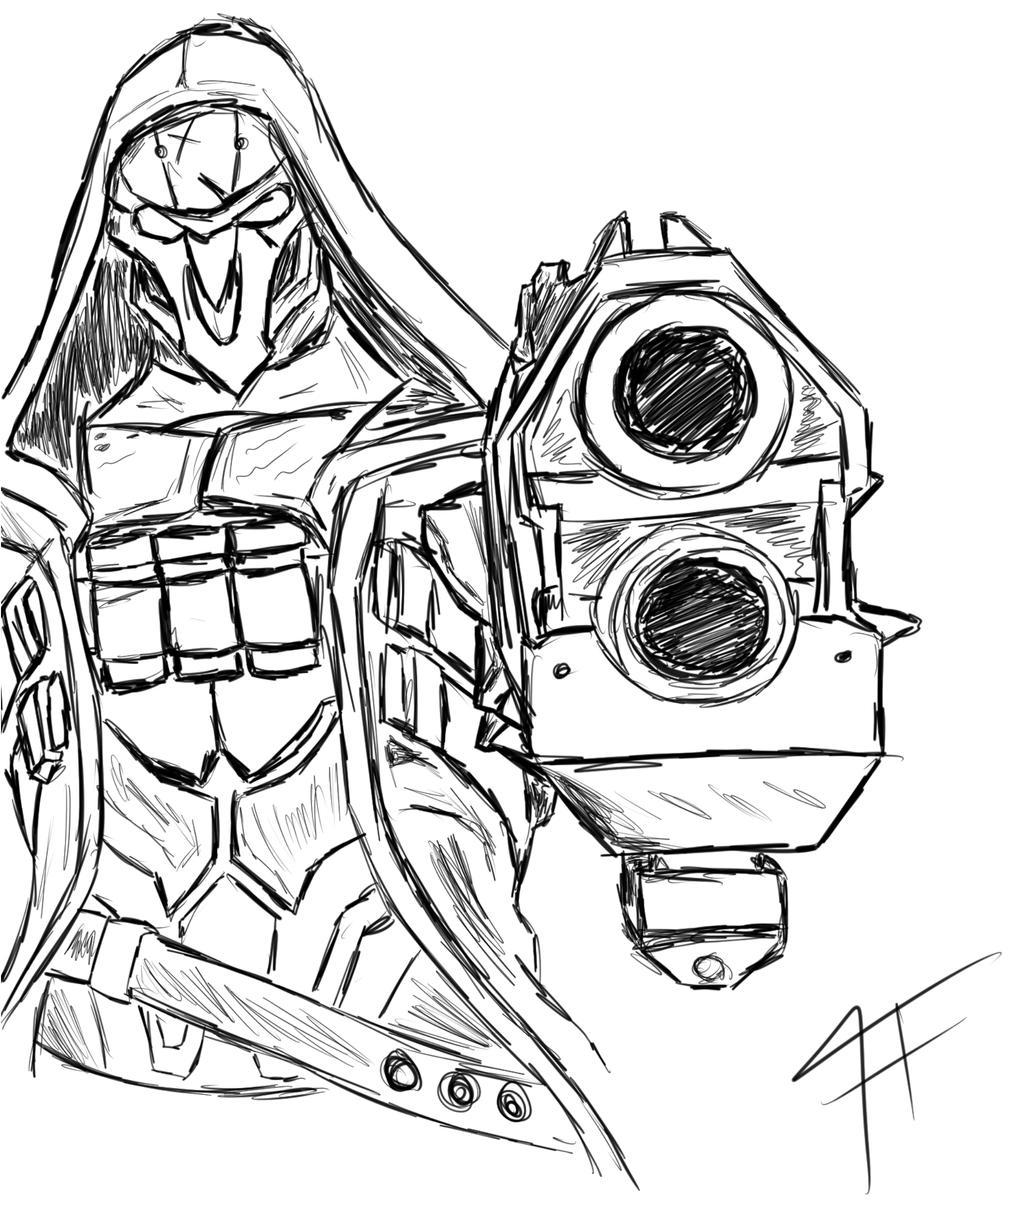 overwatch reaper by didpul on deviantart